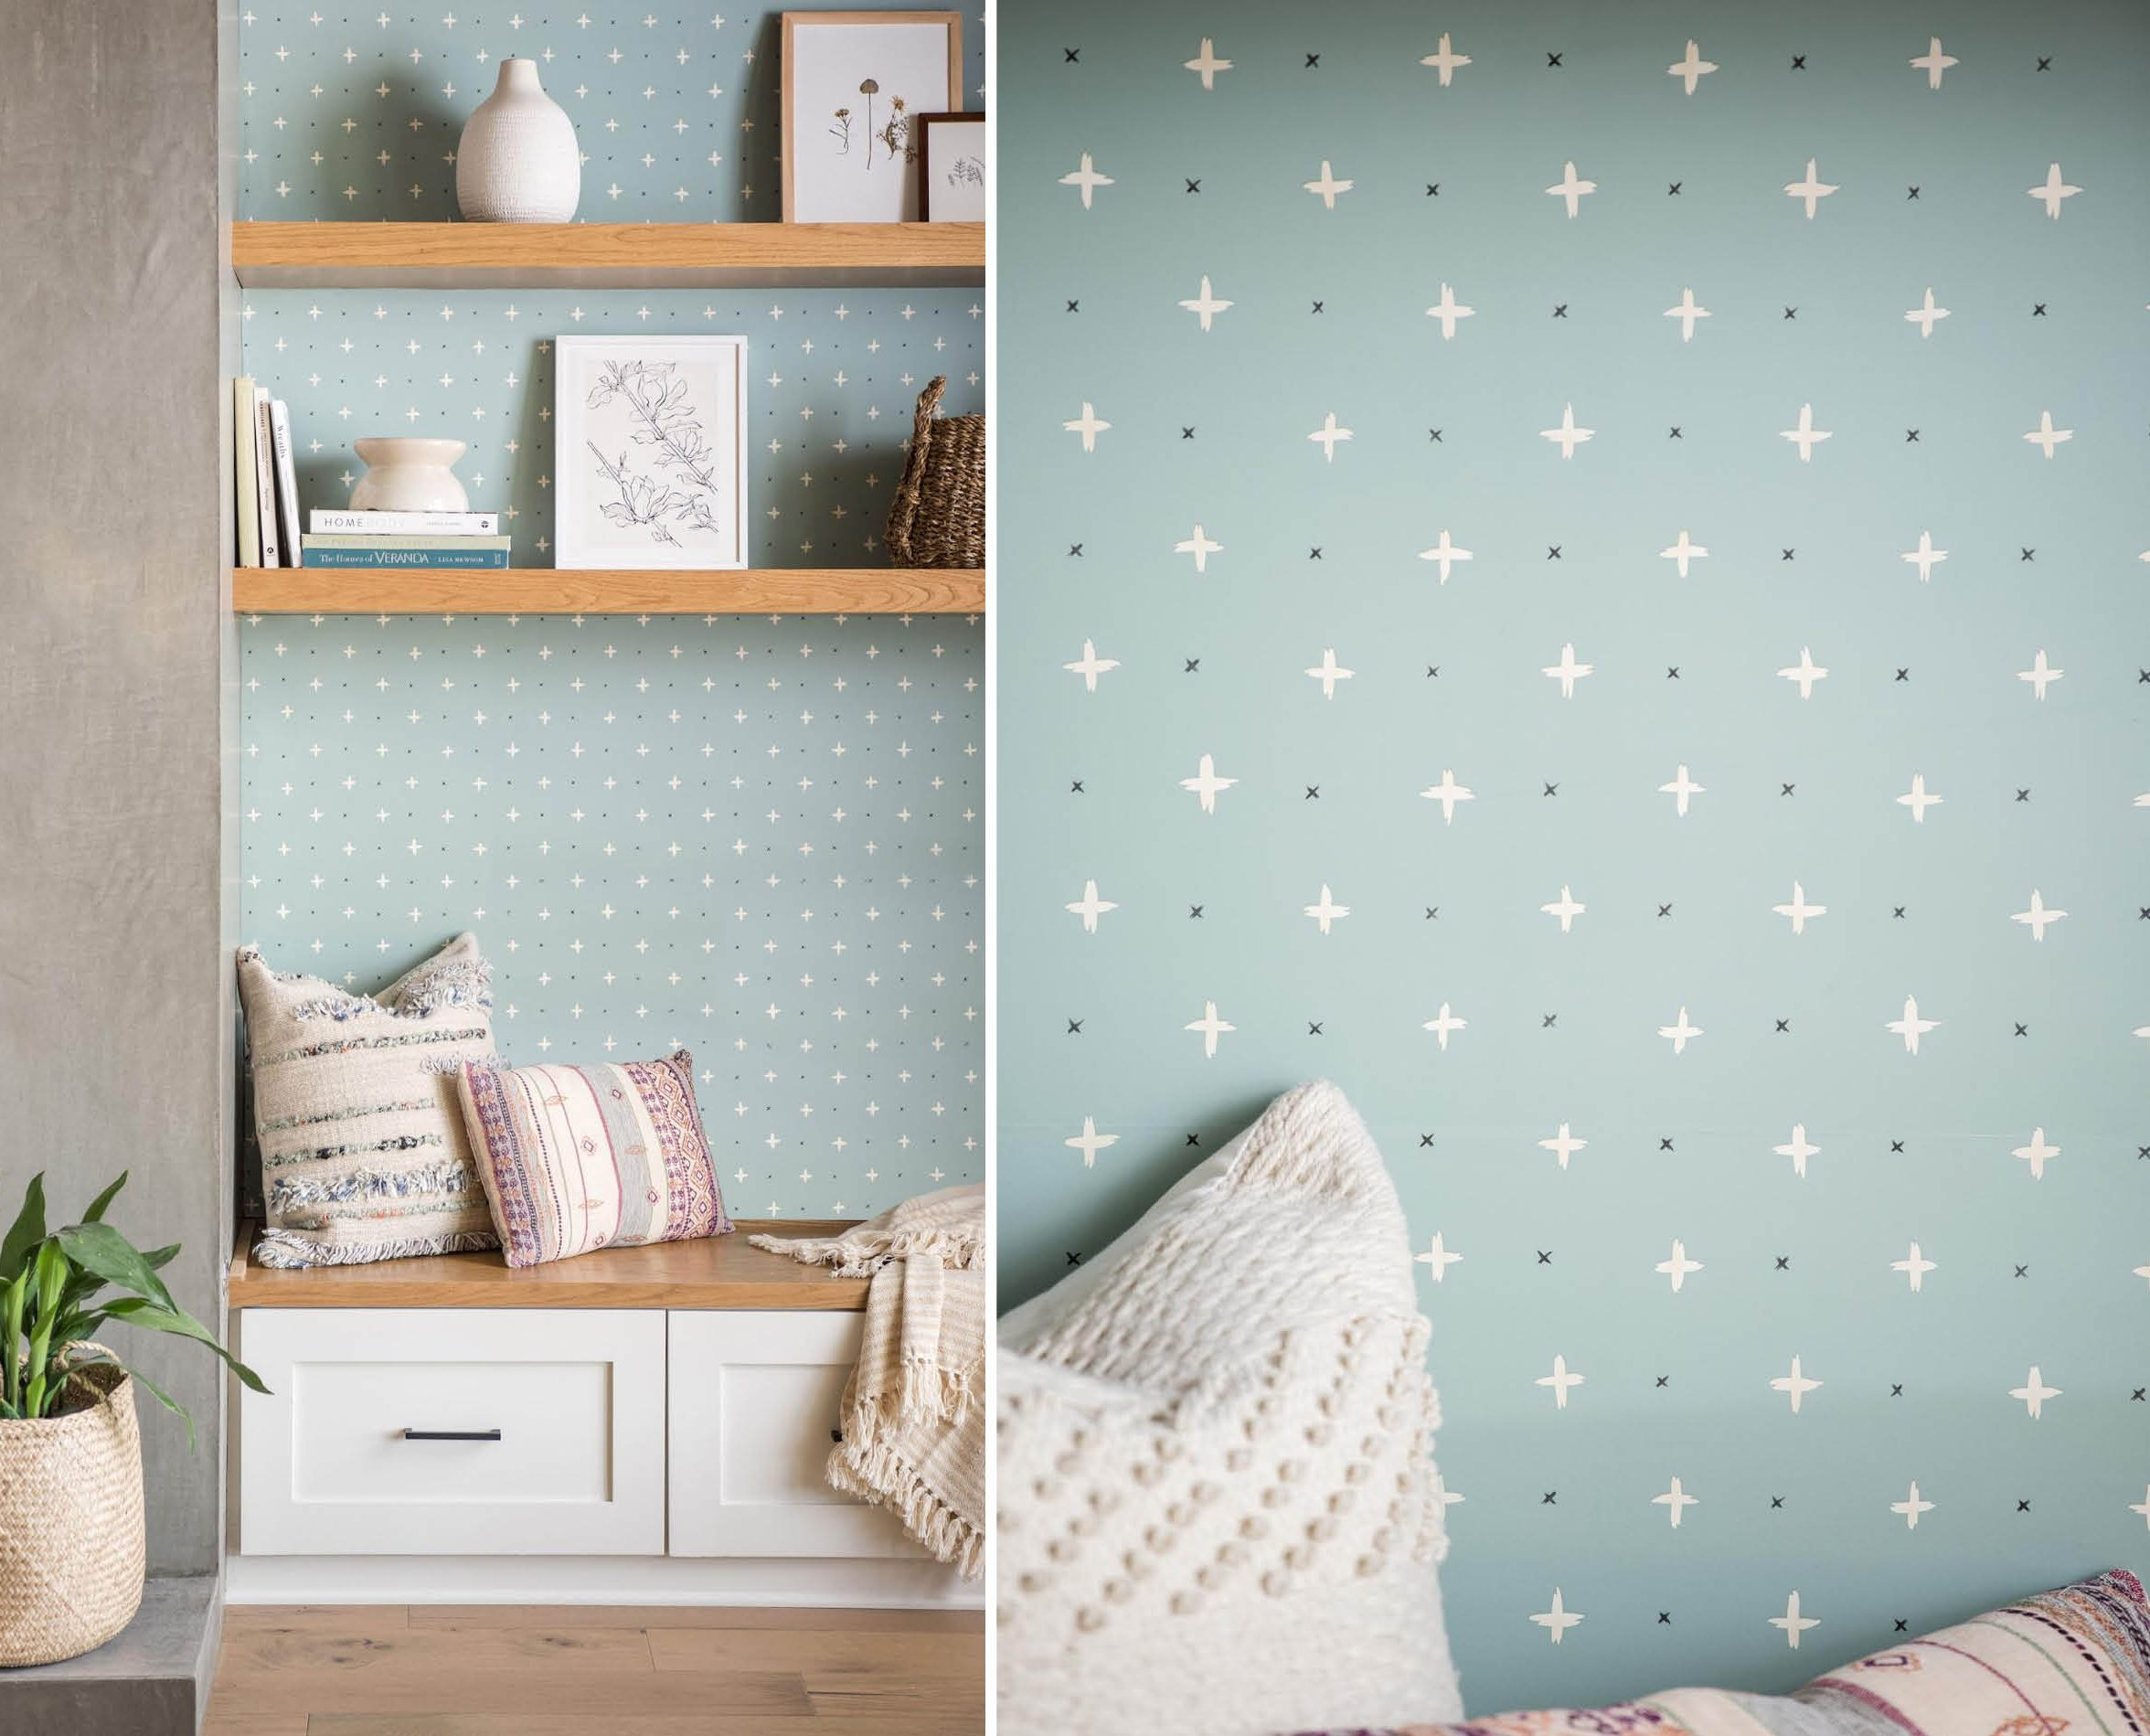 (Magnolia Home Artful Prints + Patterns—Cross Stitch MK1104)